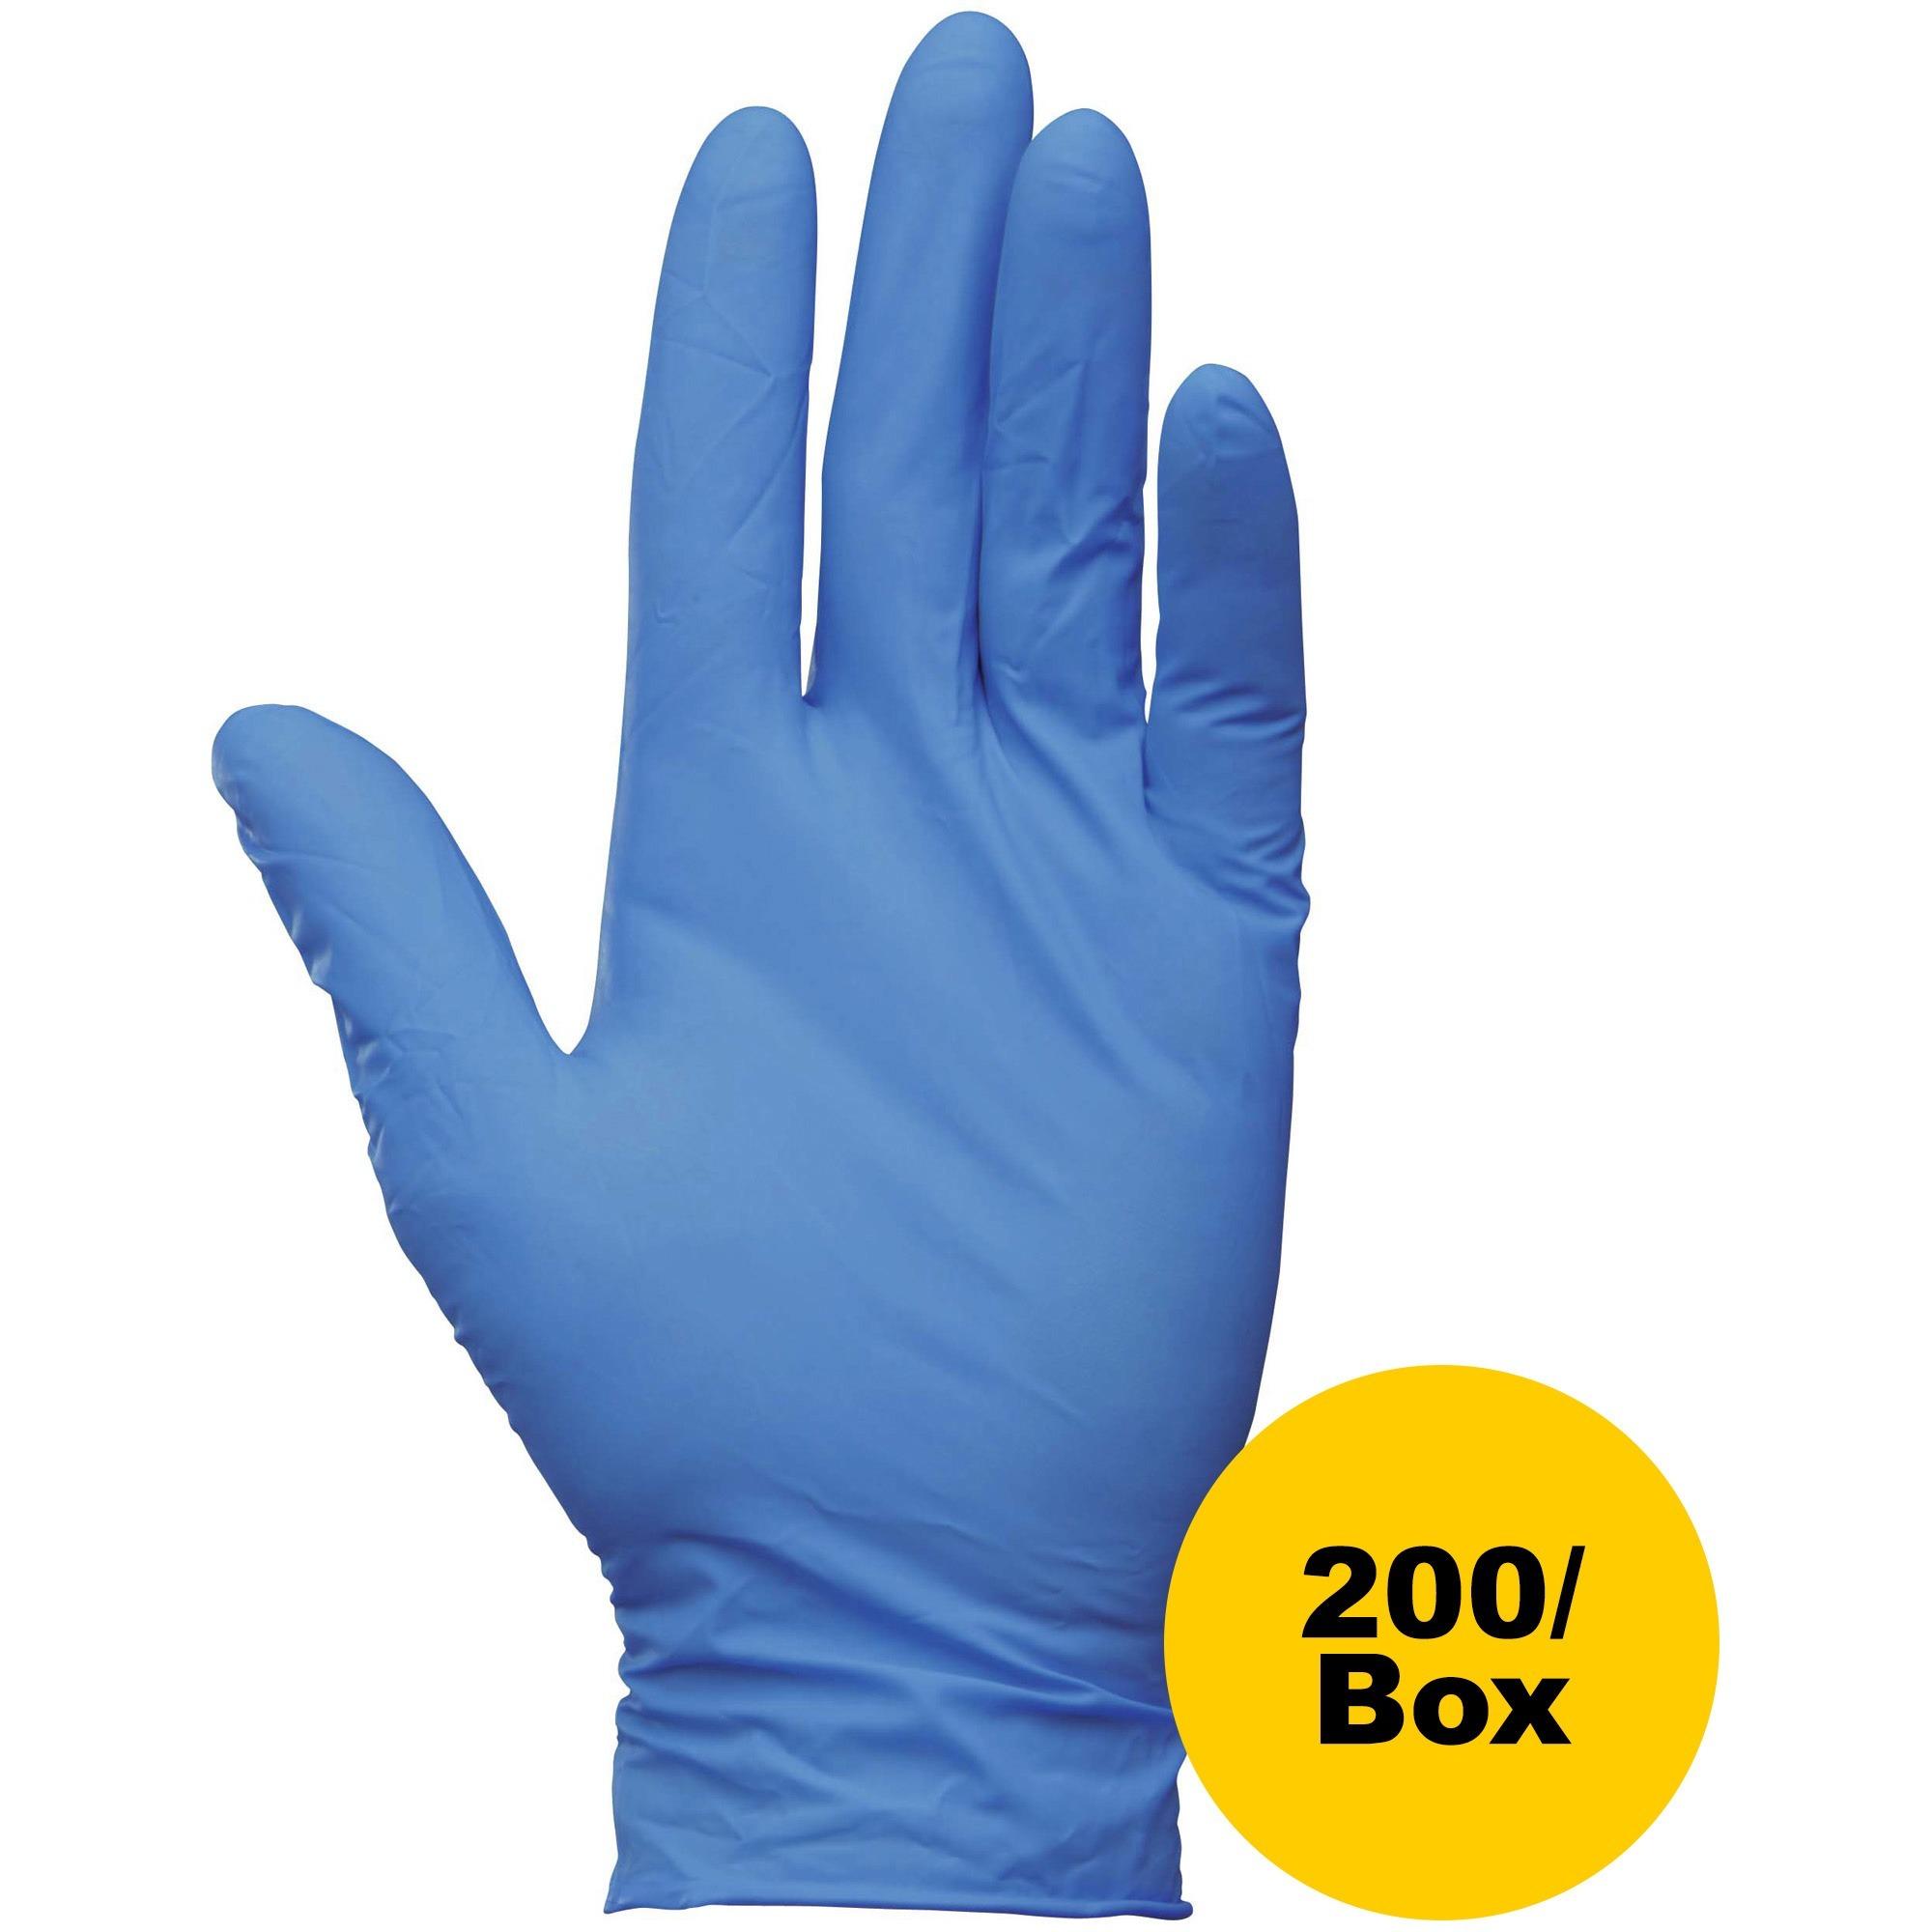 Kleenguard, KCC90097, Powder-free G10 Nitrile Gloves, 200 / Box, Arctic Blue